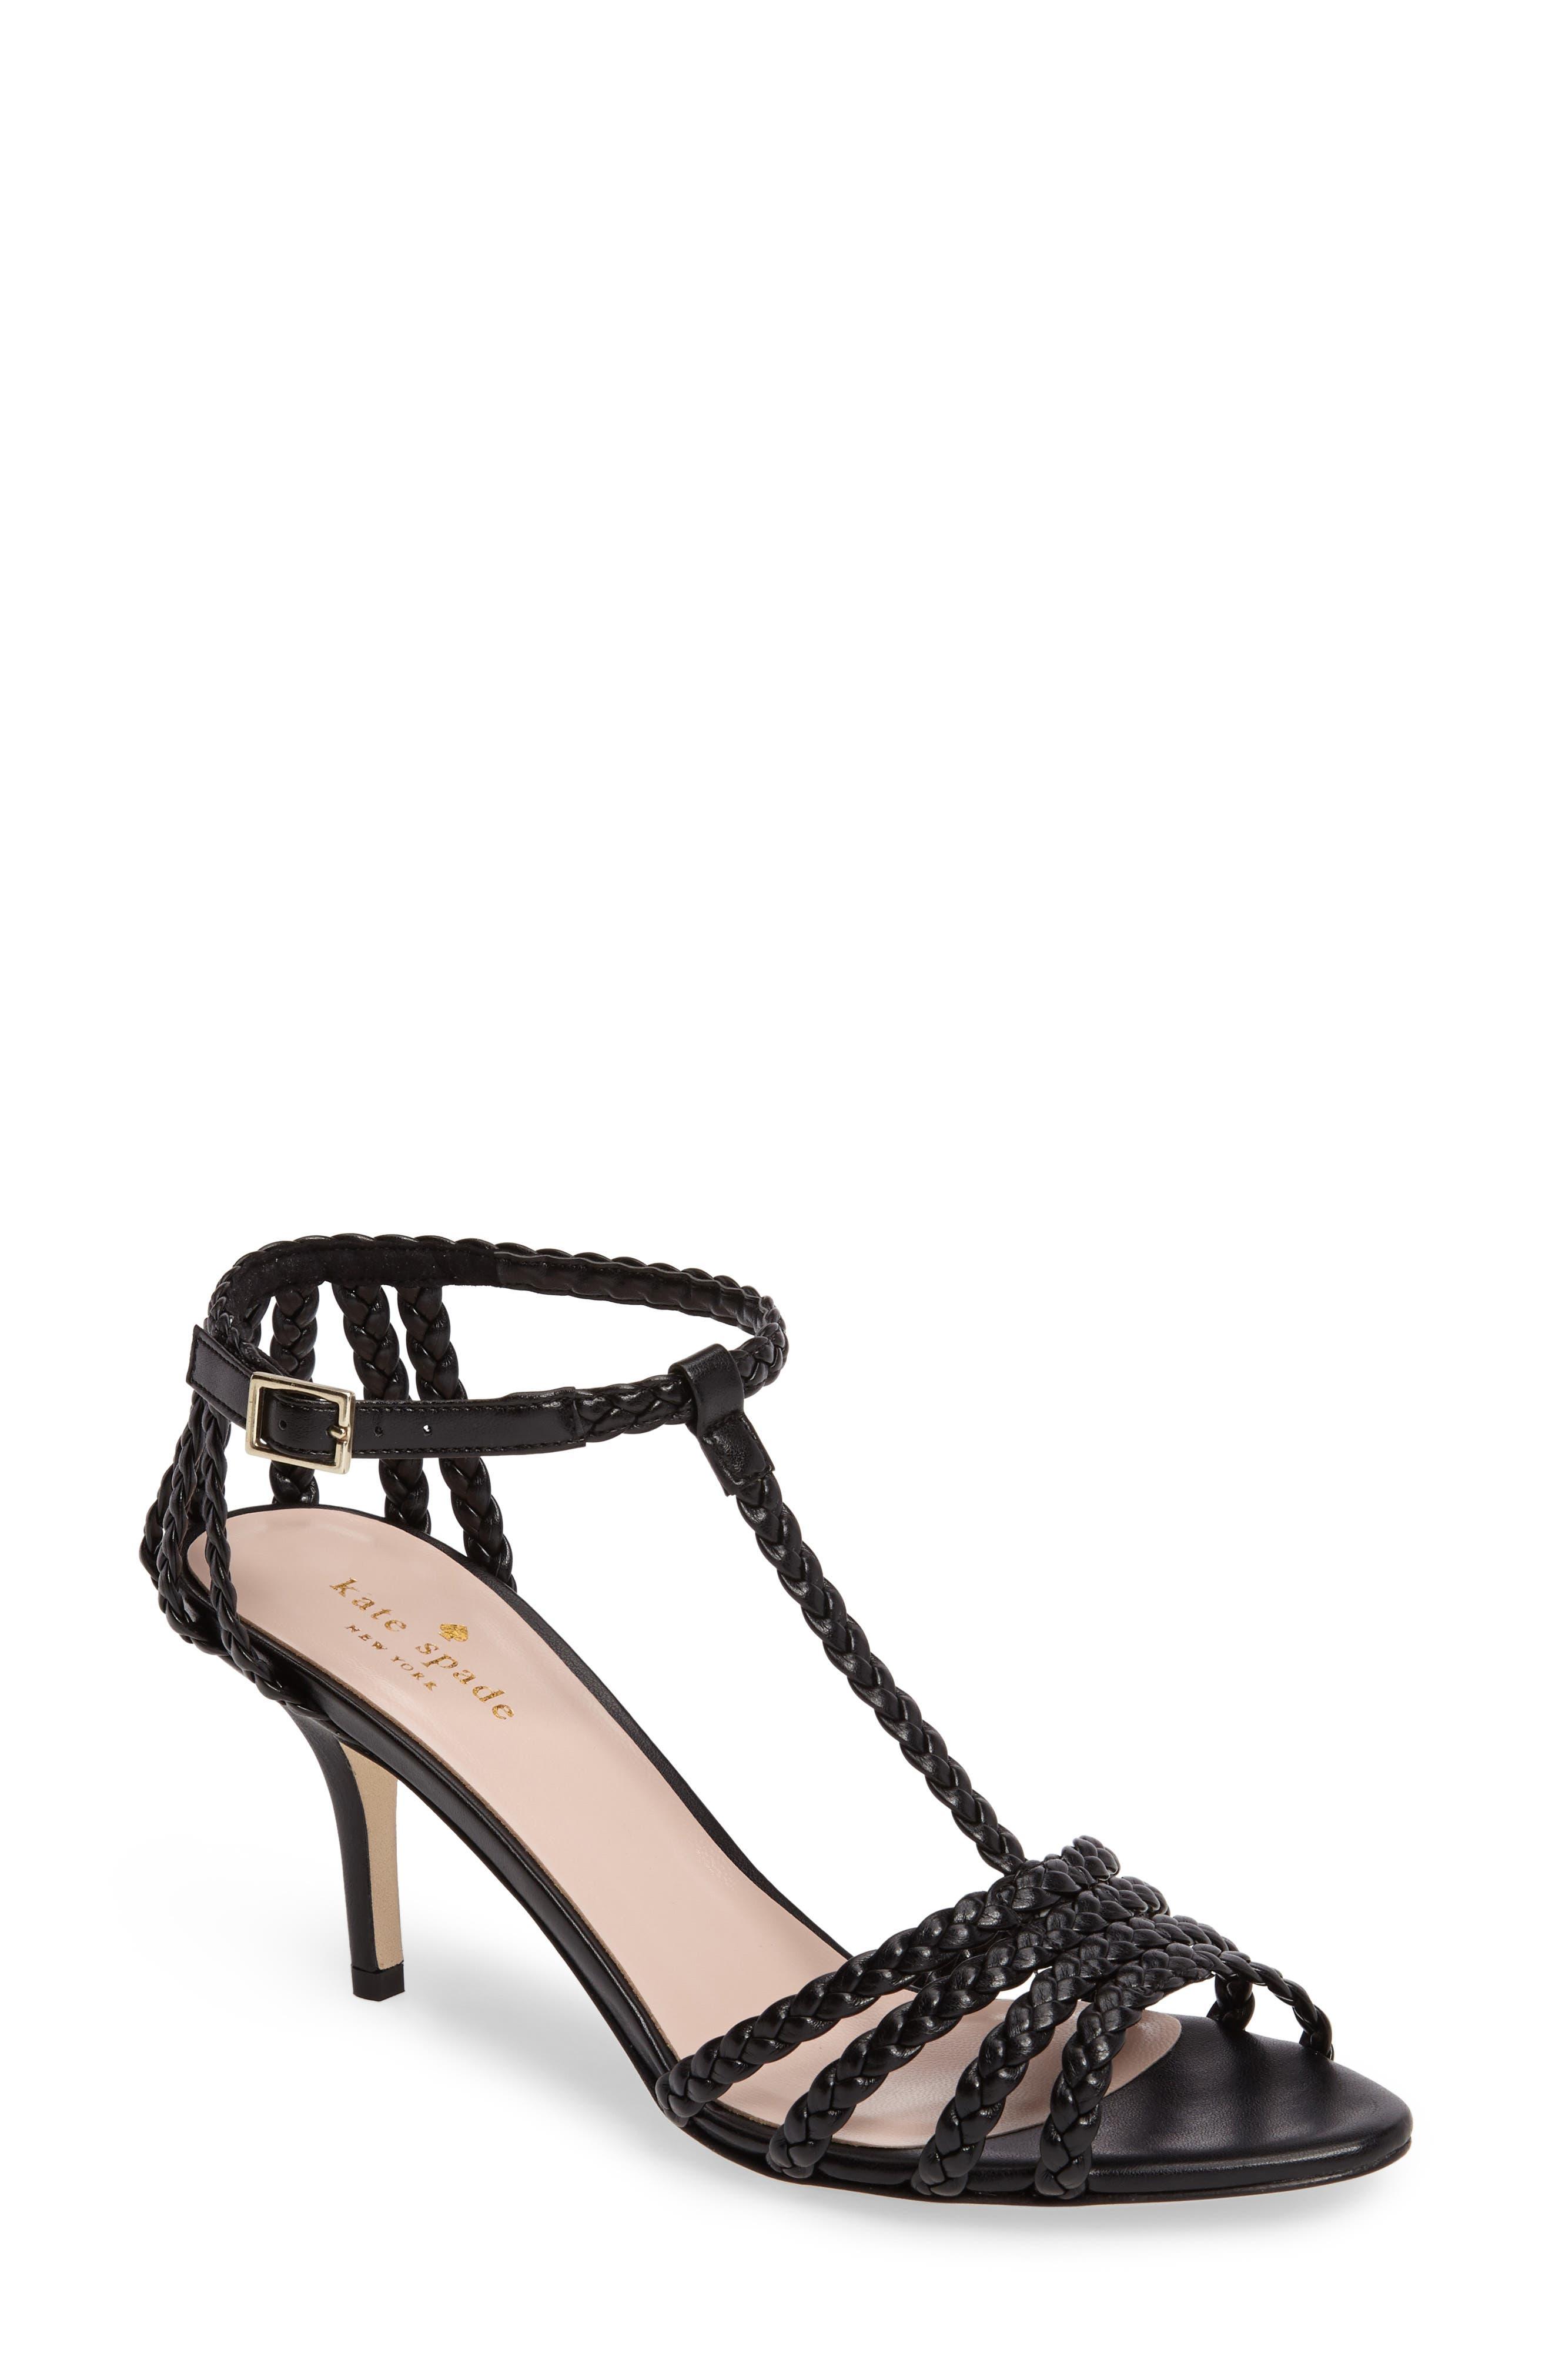 sullivan strappy sandal,                             Main thumbnail 1, color,                             001